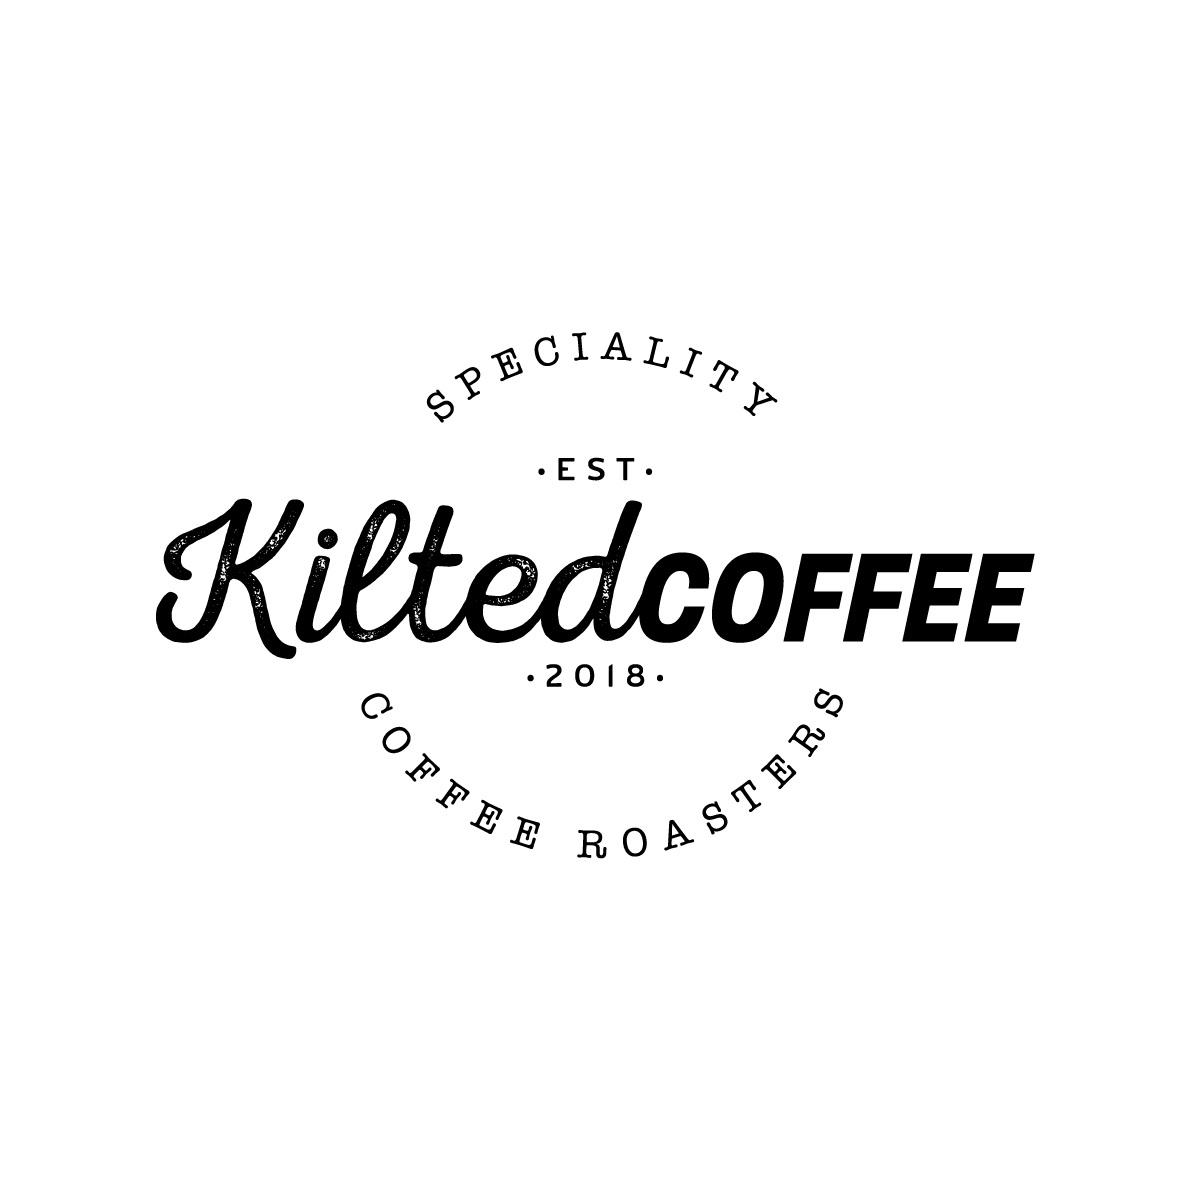 Kilted Coffee